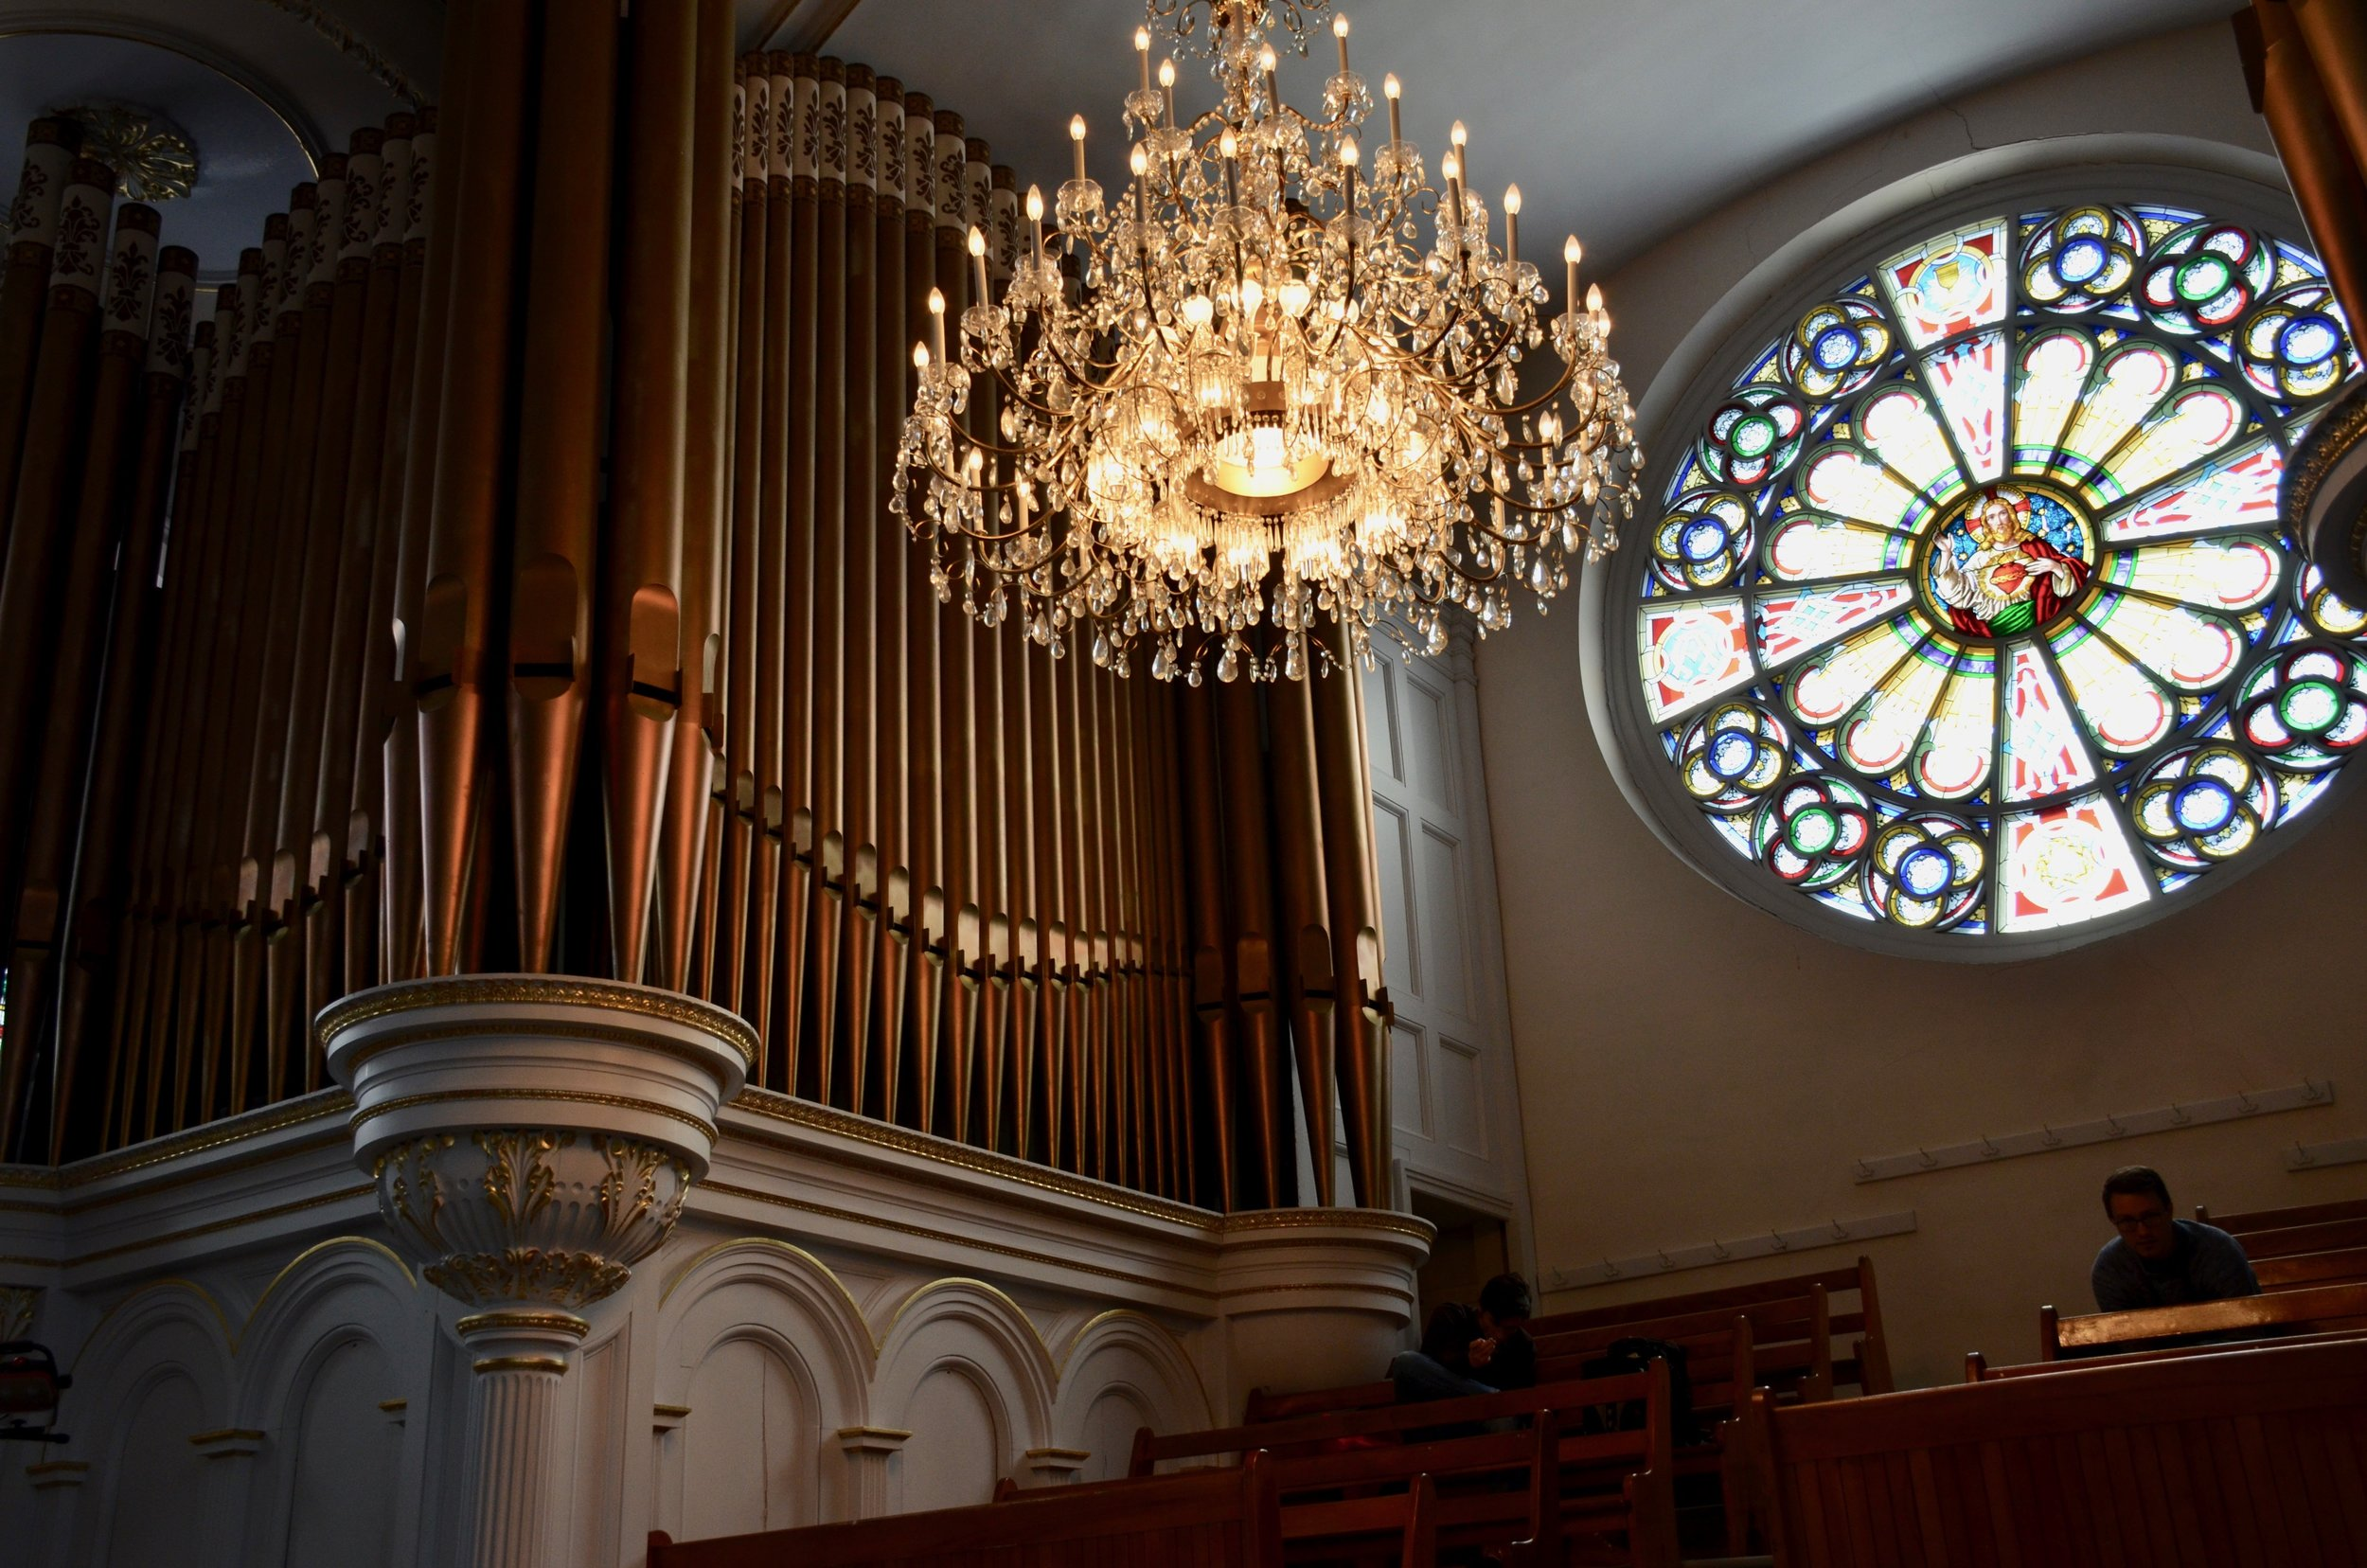 Casavant organ,Cathedral of St.Hyacinthe, Quebec